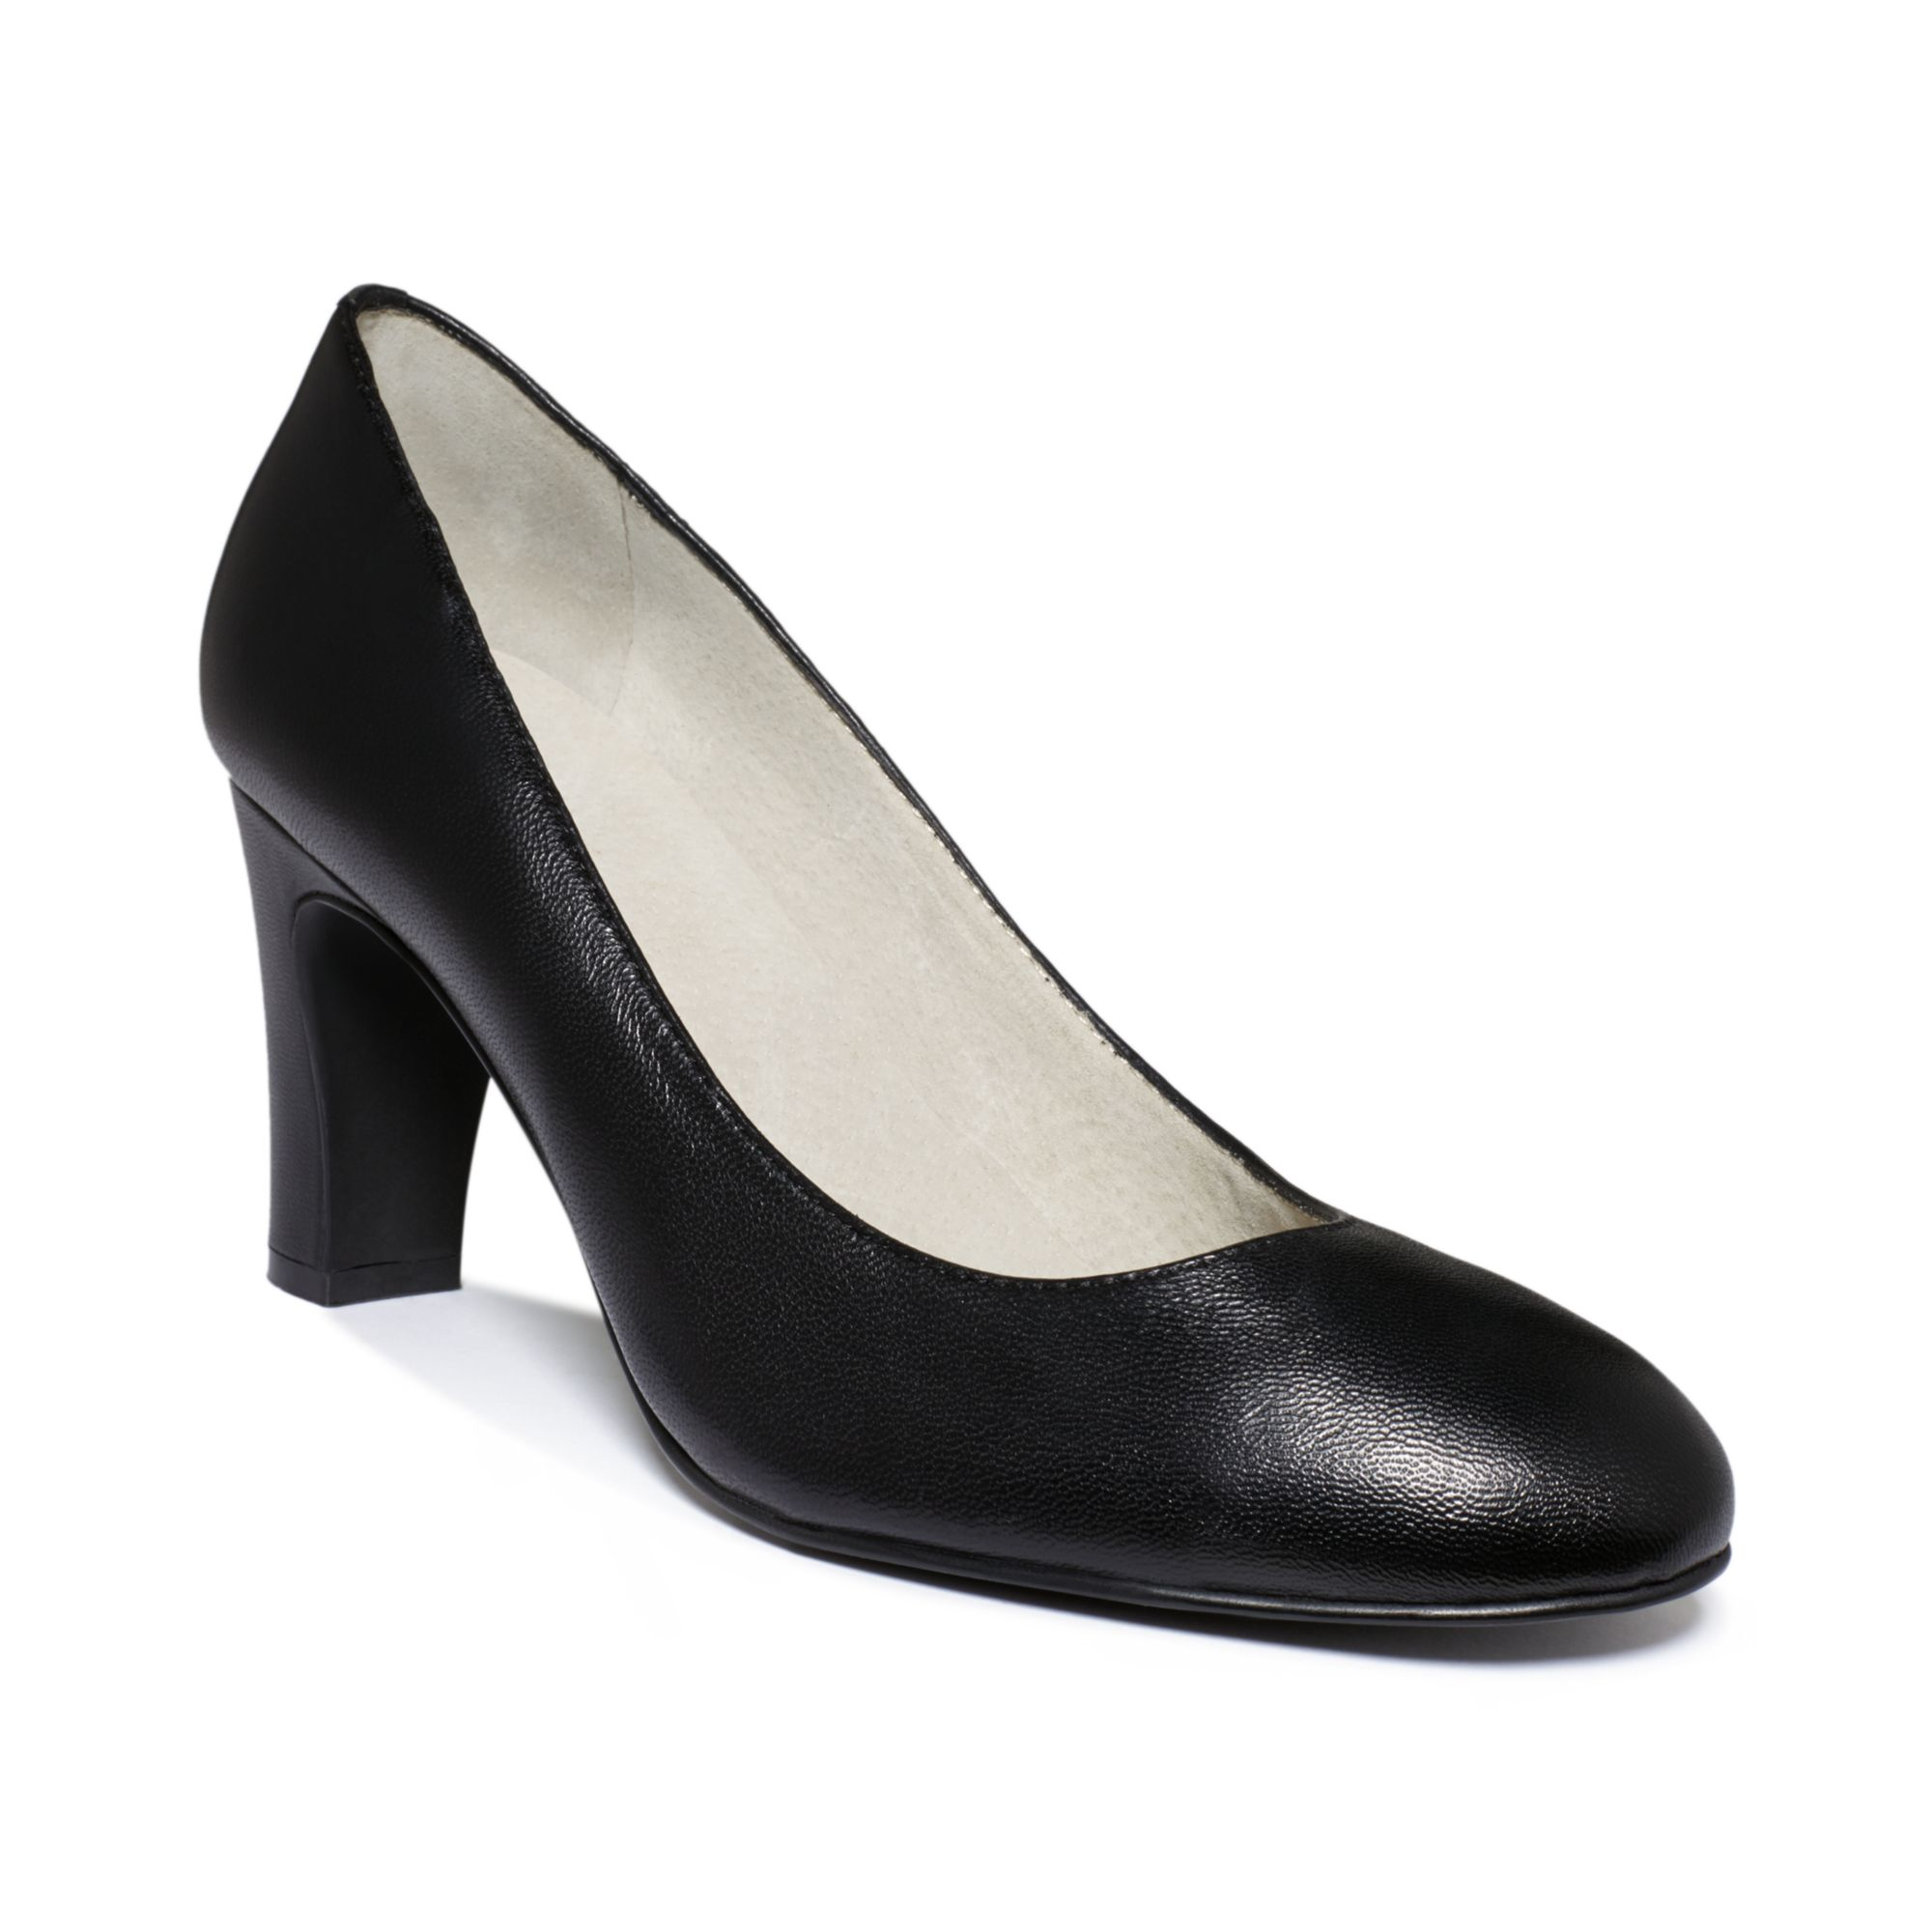 Tahari Womens Polly Mid Heel Pumps in Black | Lyst